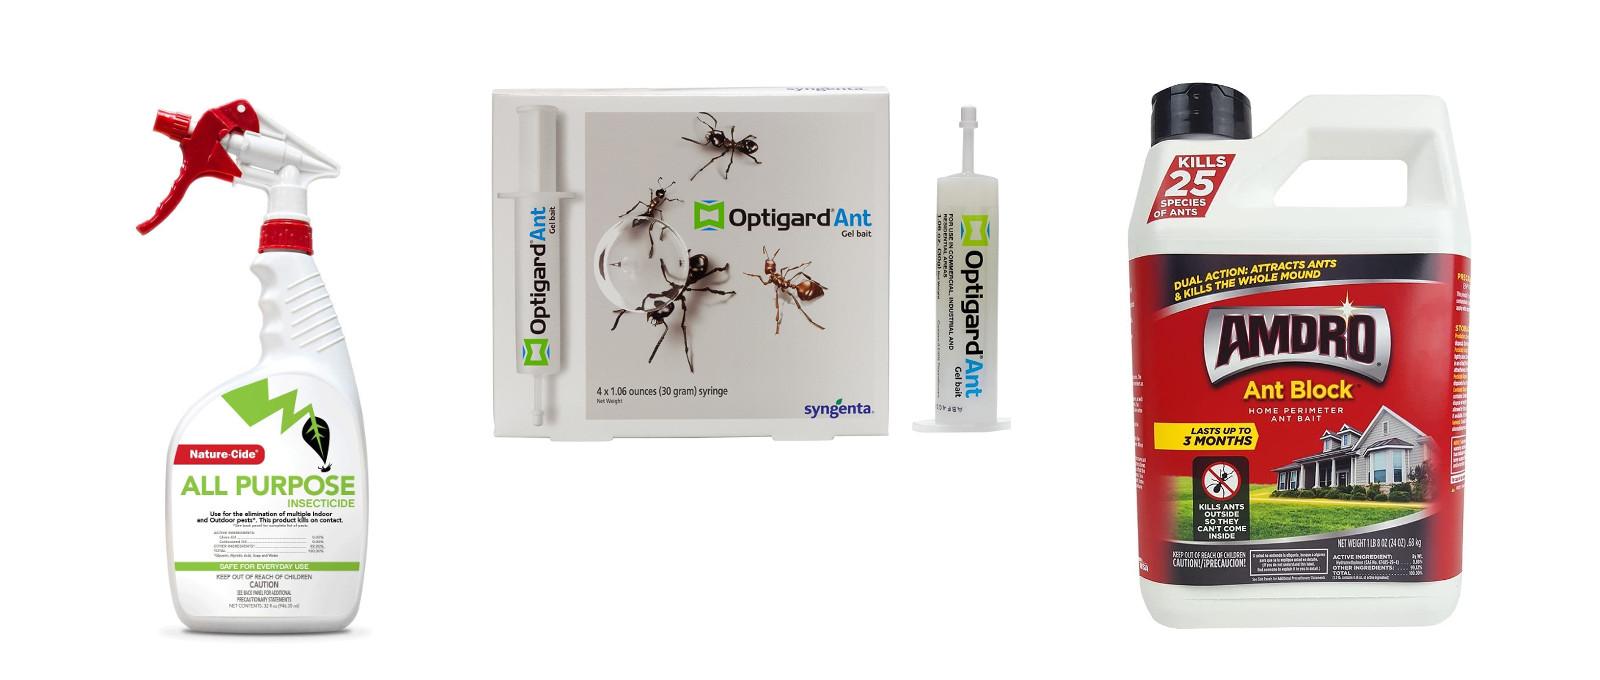 Ant killer and bait